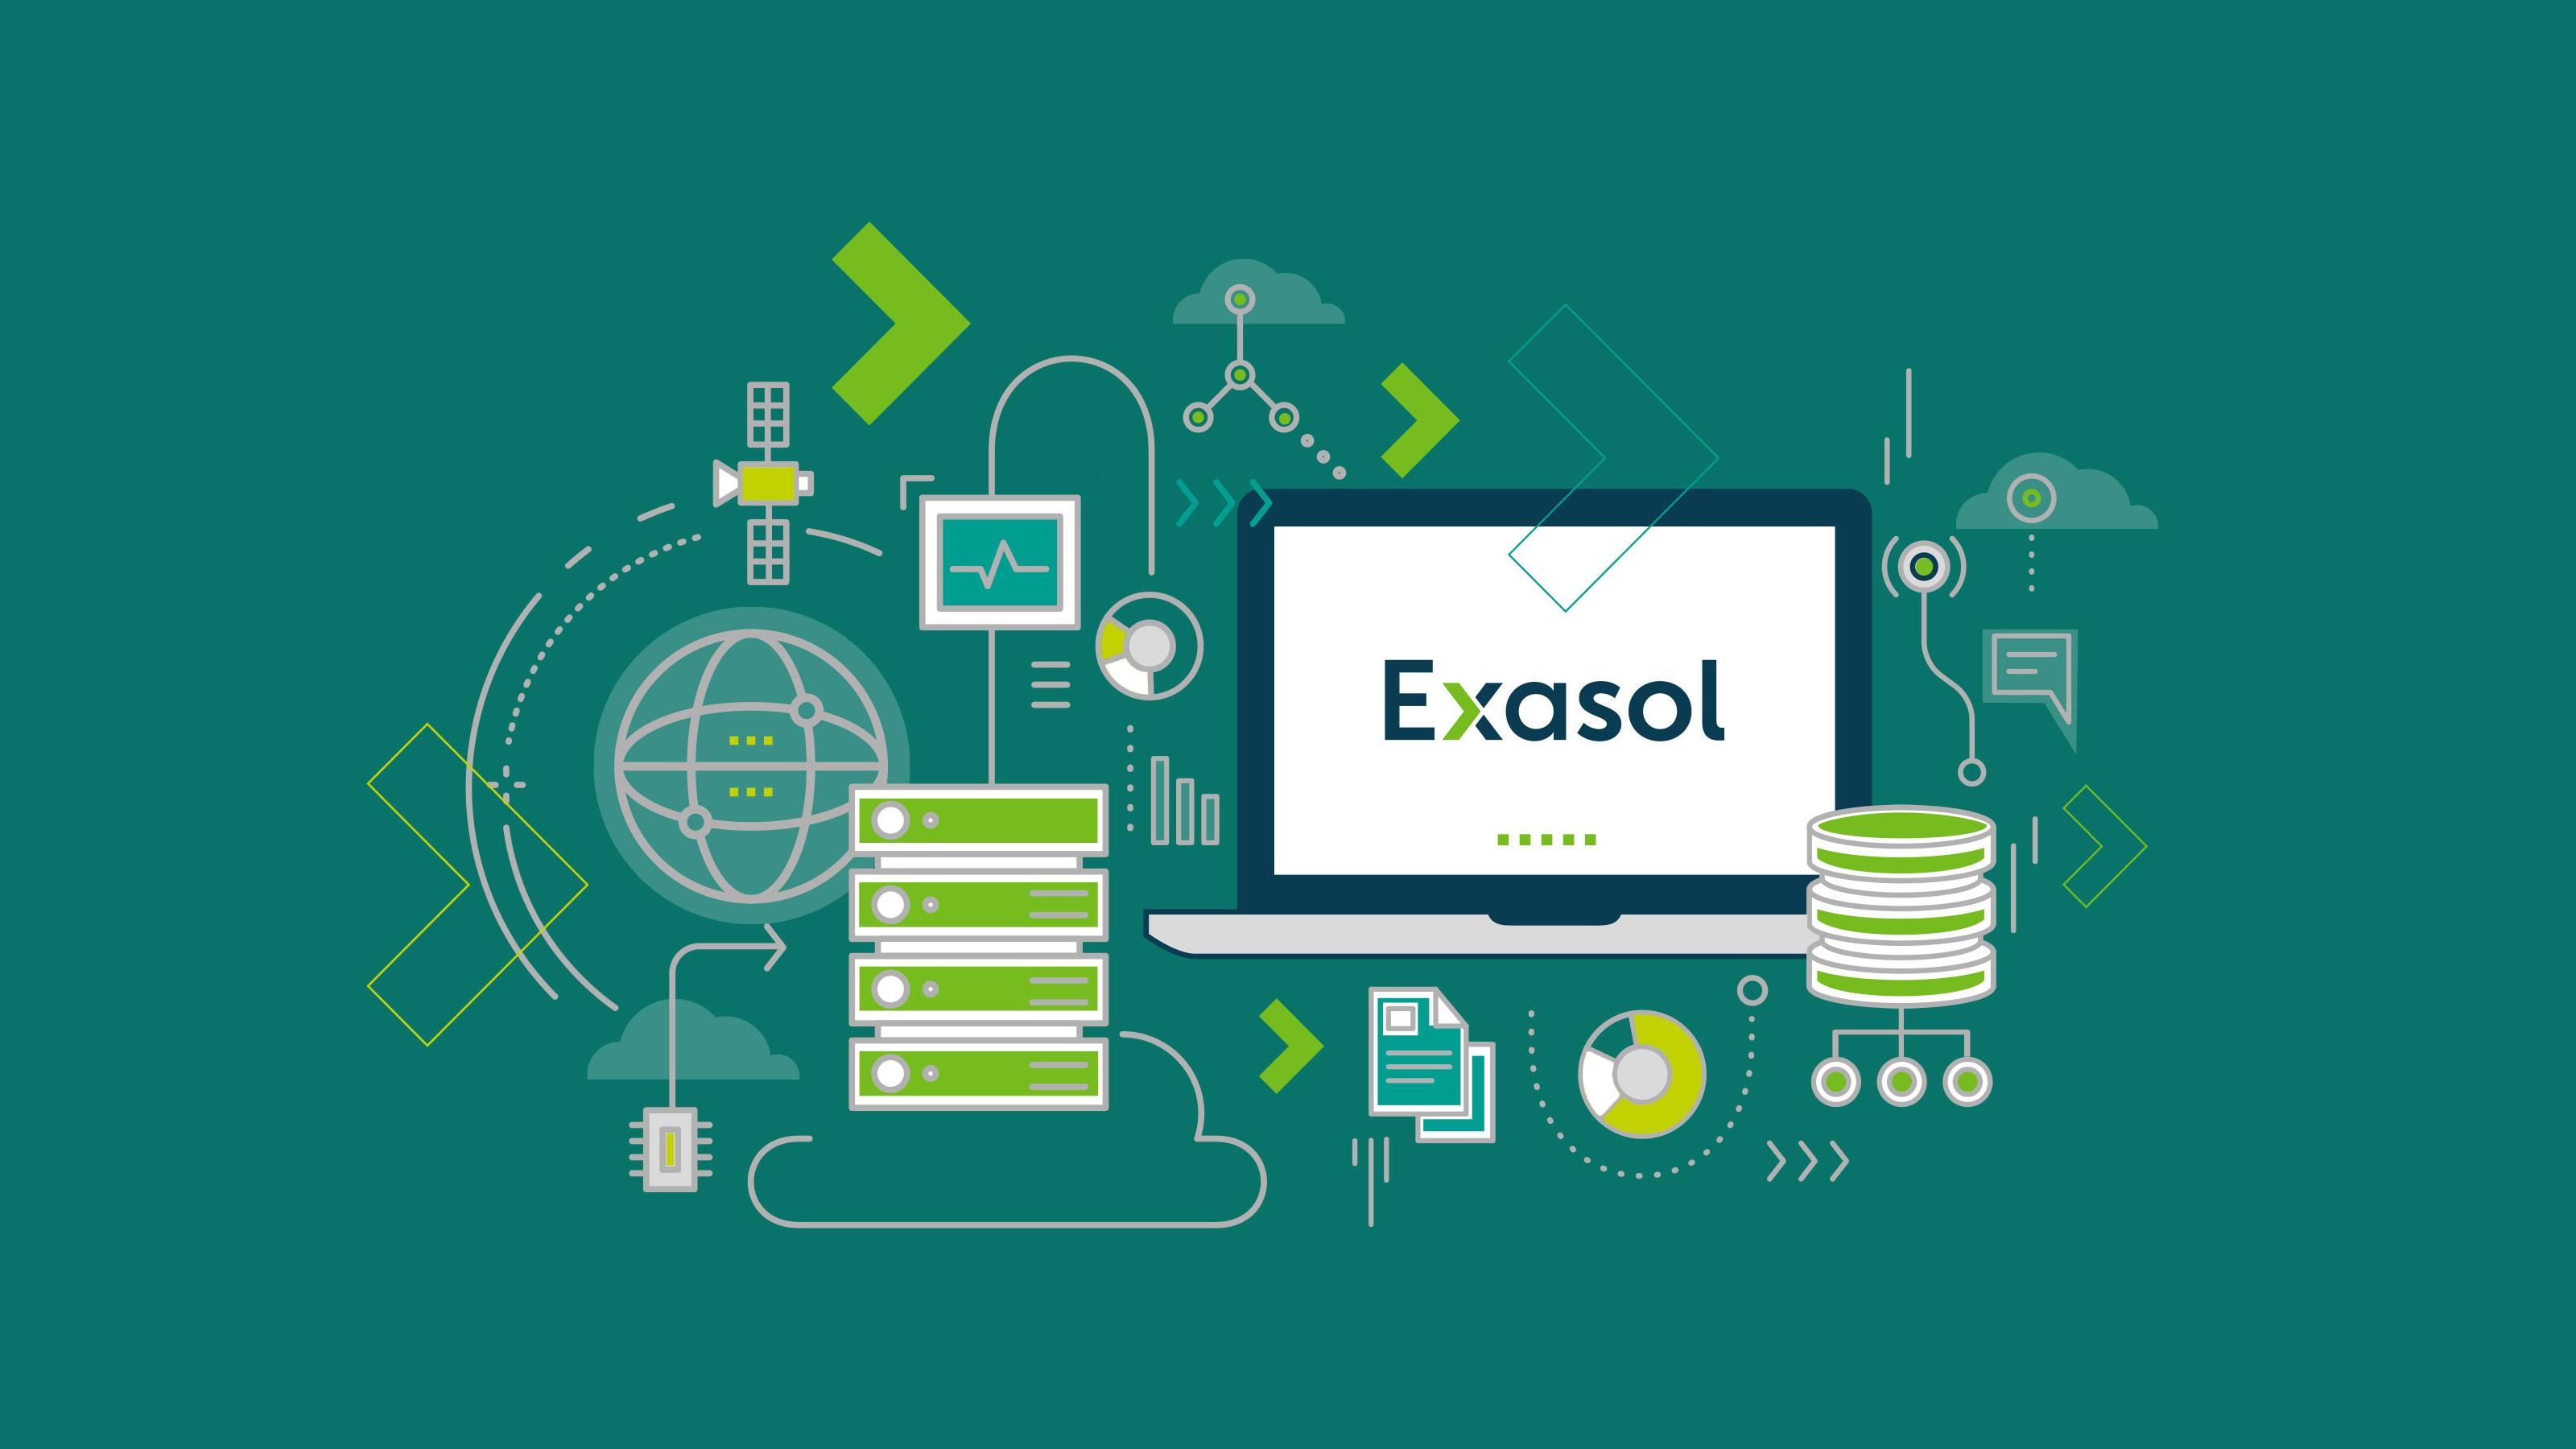 Brand illustration technology Exasol